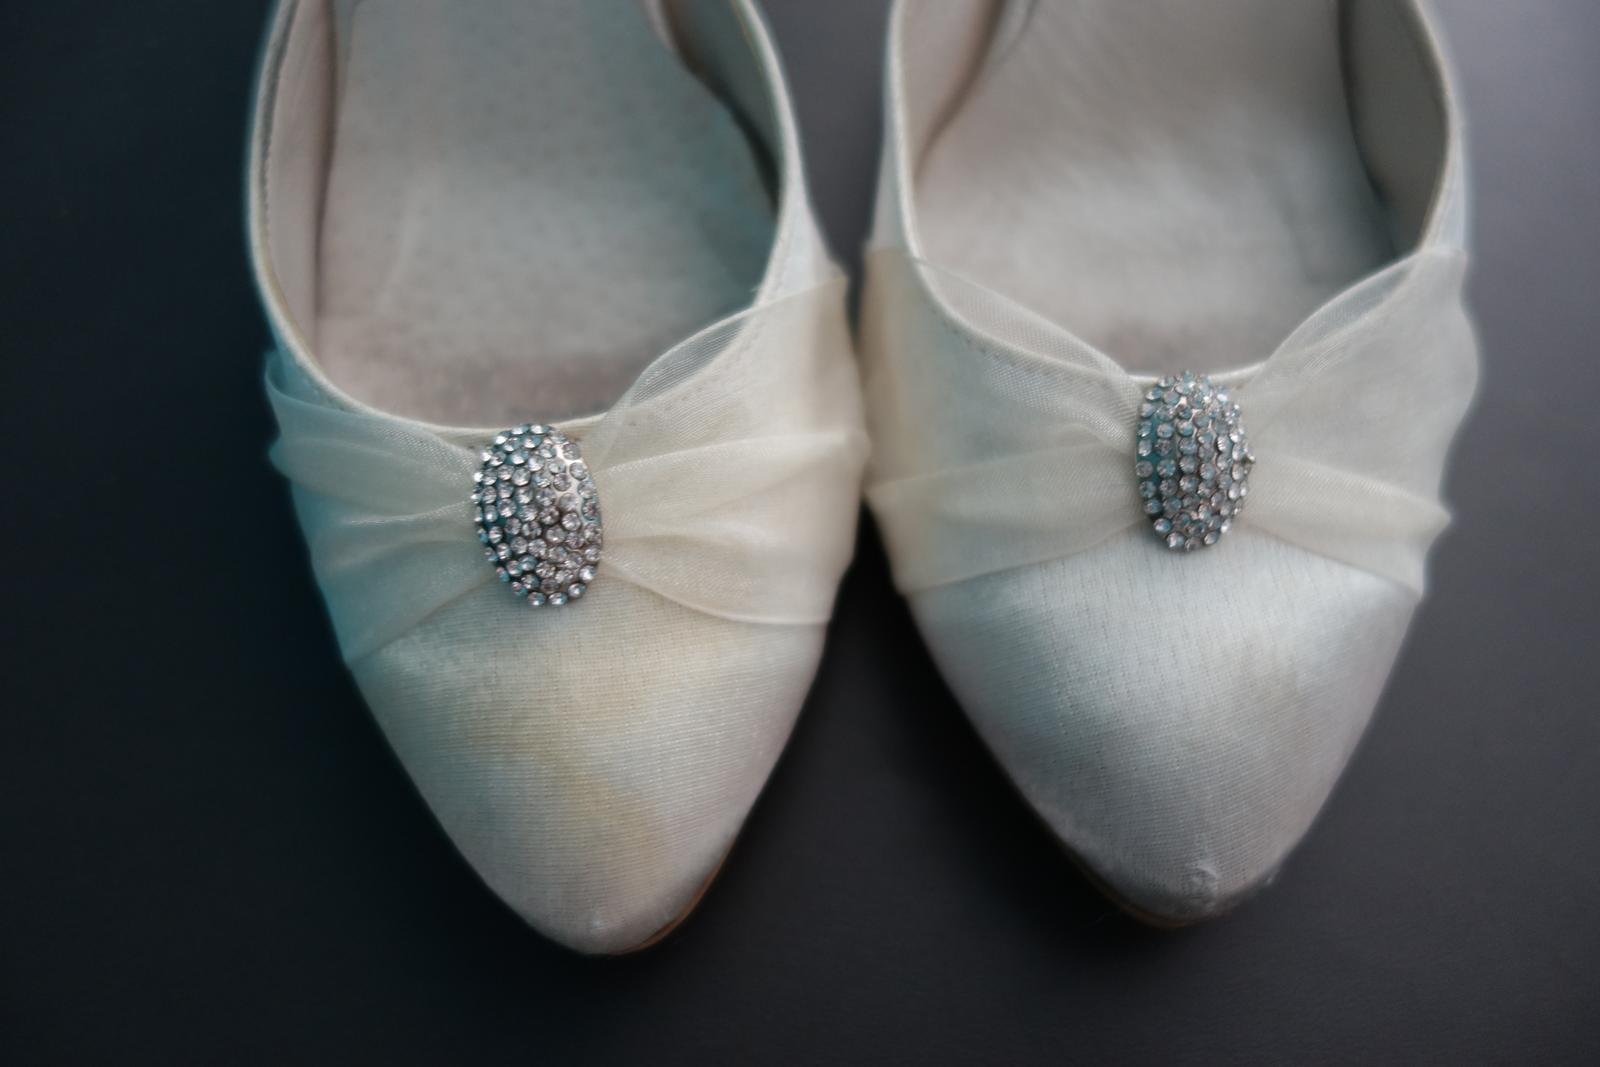 Svadobné/spoločenské topánky č. 40 - 41 - Obrázok č. 4